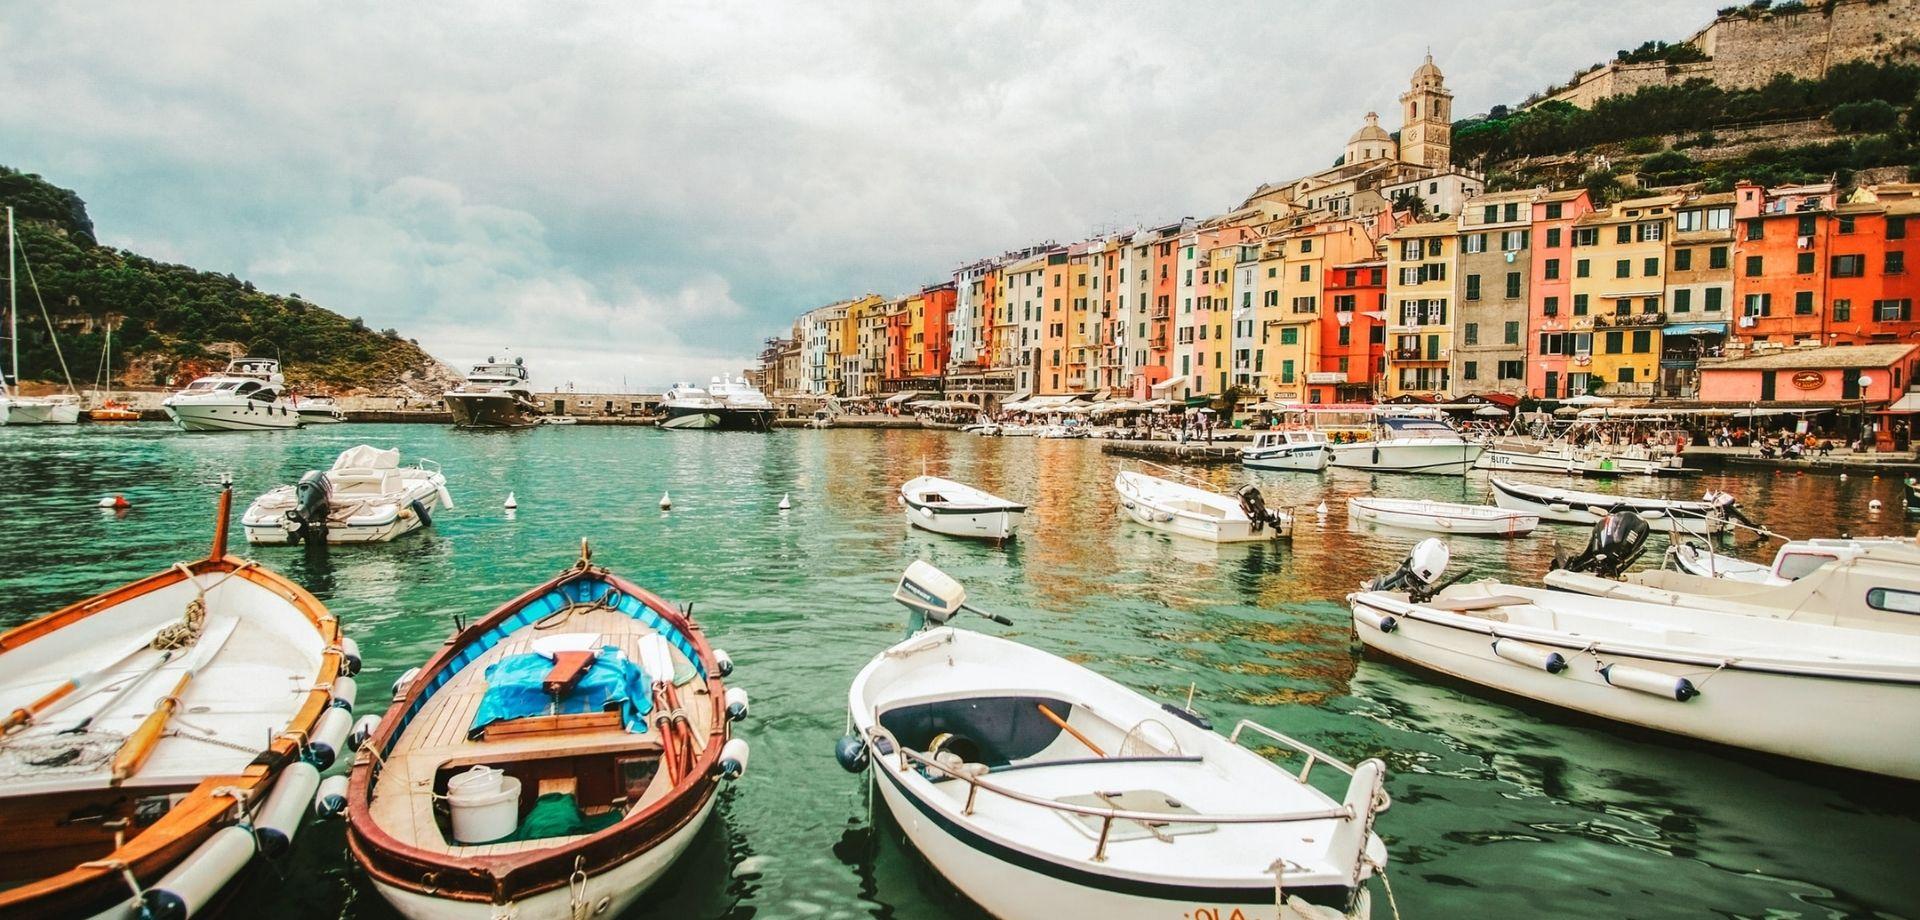 Portovenere and the beautiful Lunigiana